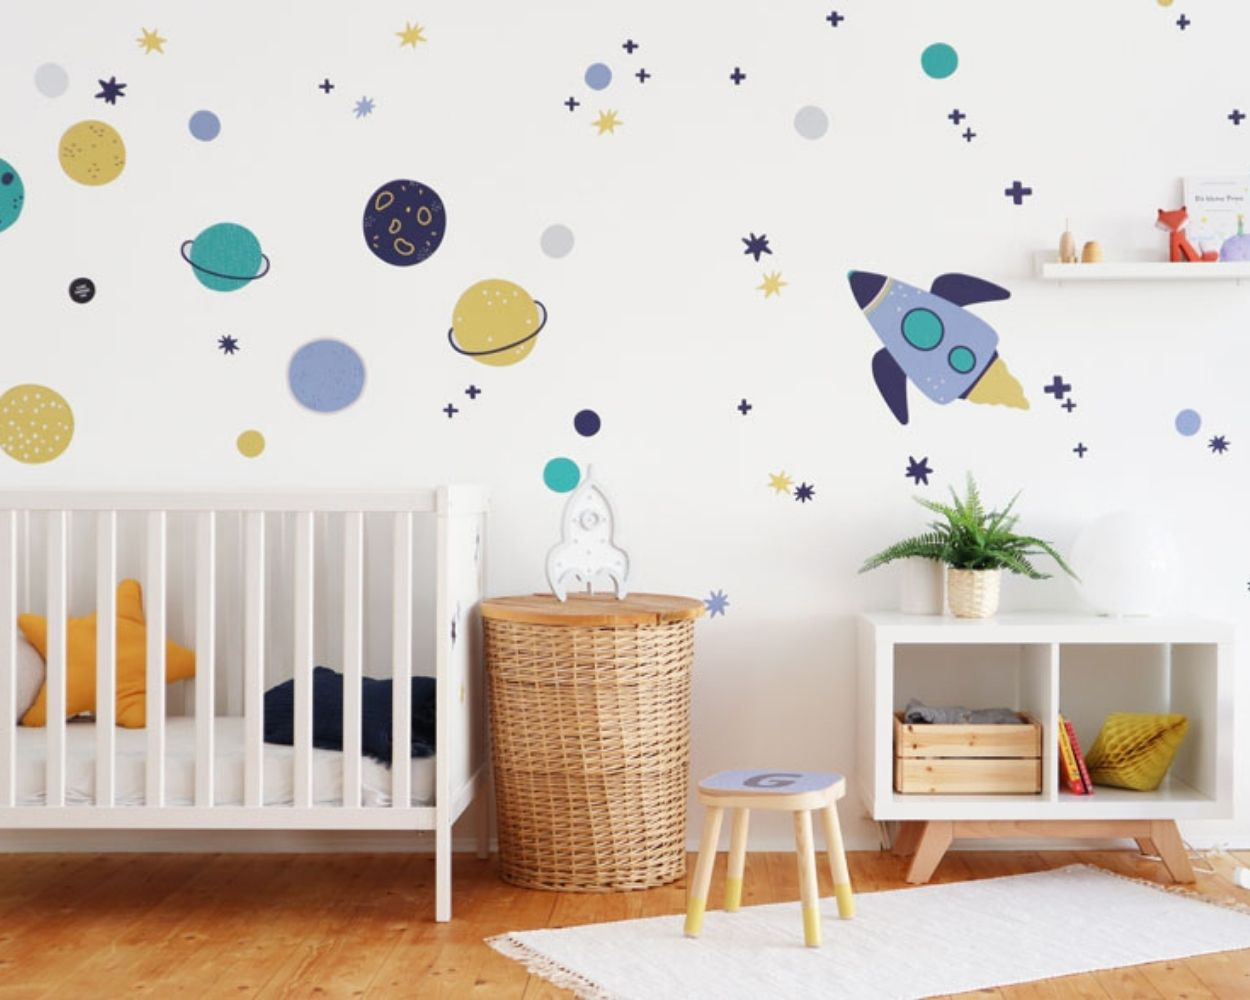 Wandgestaltung Kinderzimmer Ikea Hacks